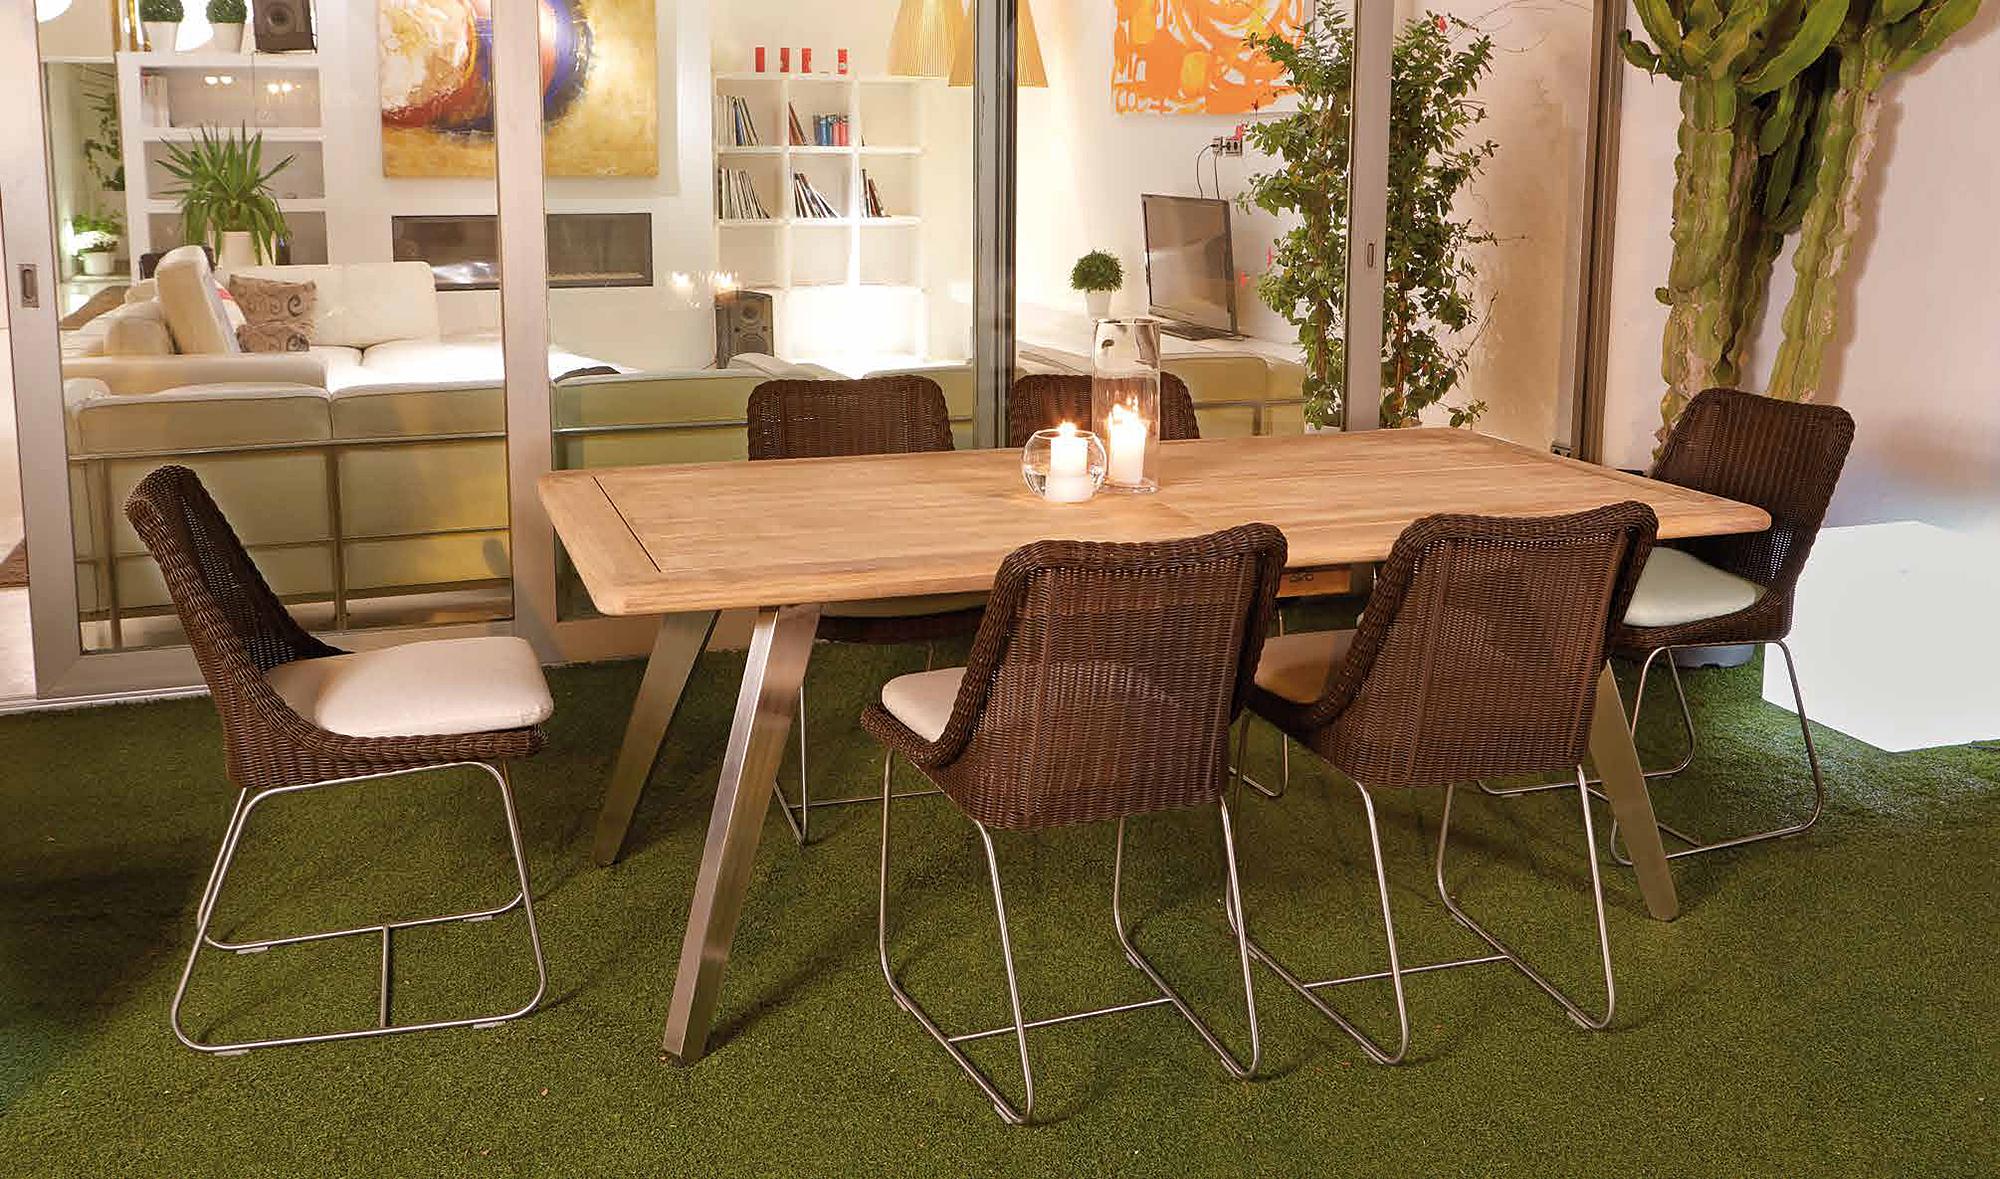 Mesa De Comedor Extensible Jard N Fleur En Portobellostreet Es # Muebles De Jardin Wicker